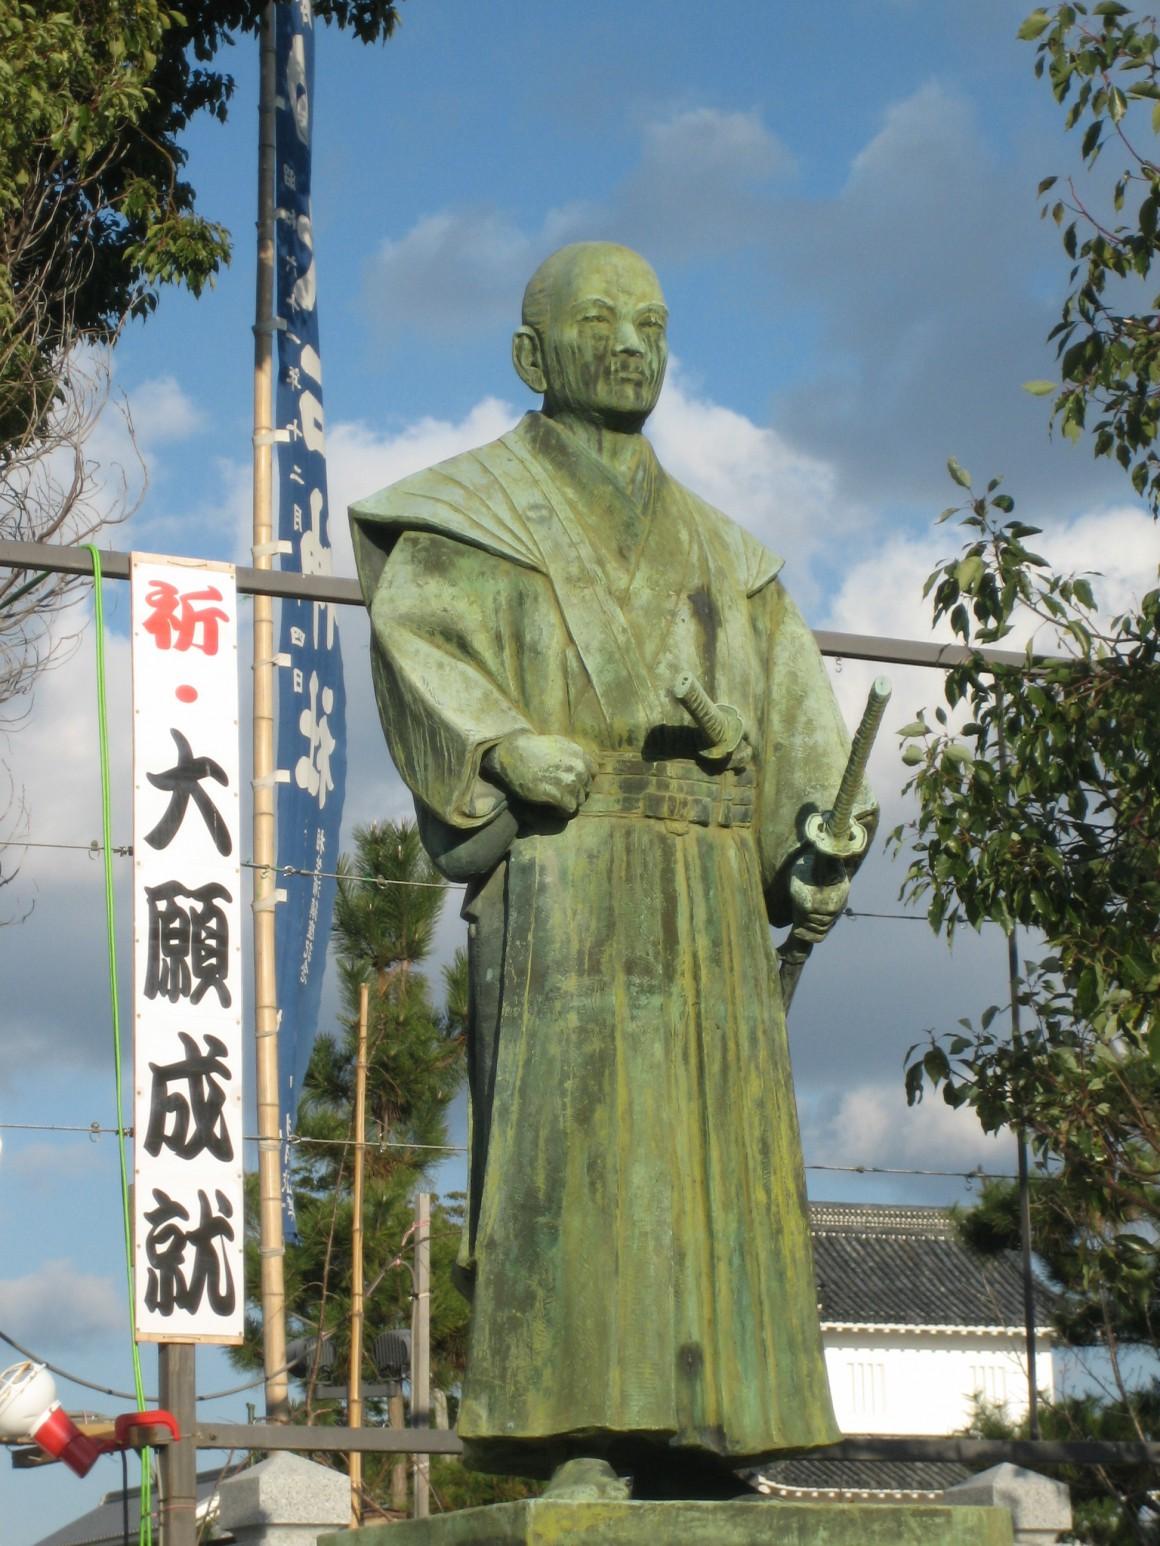 estatua en honor de Ouishi